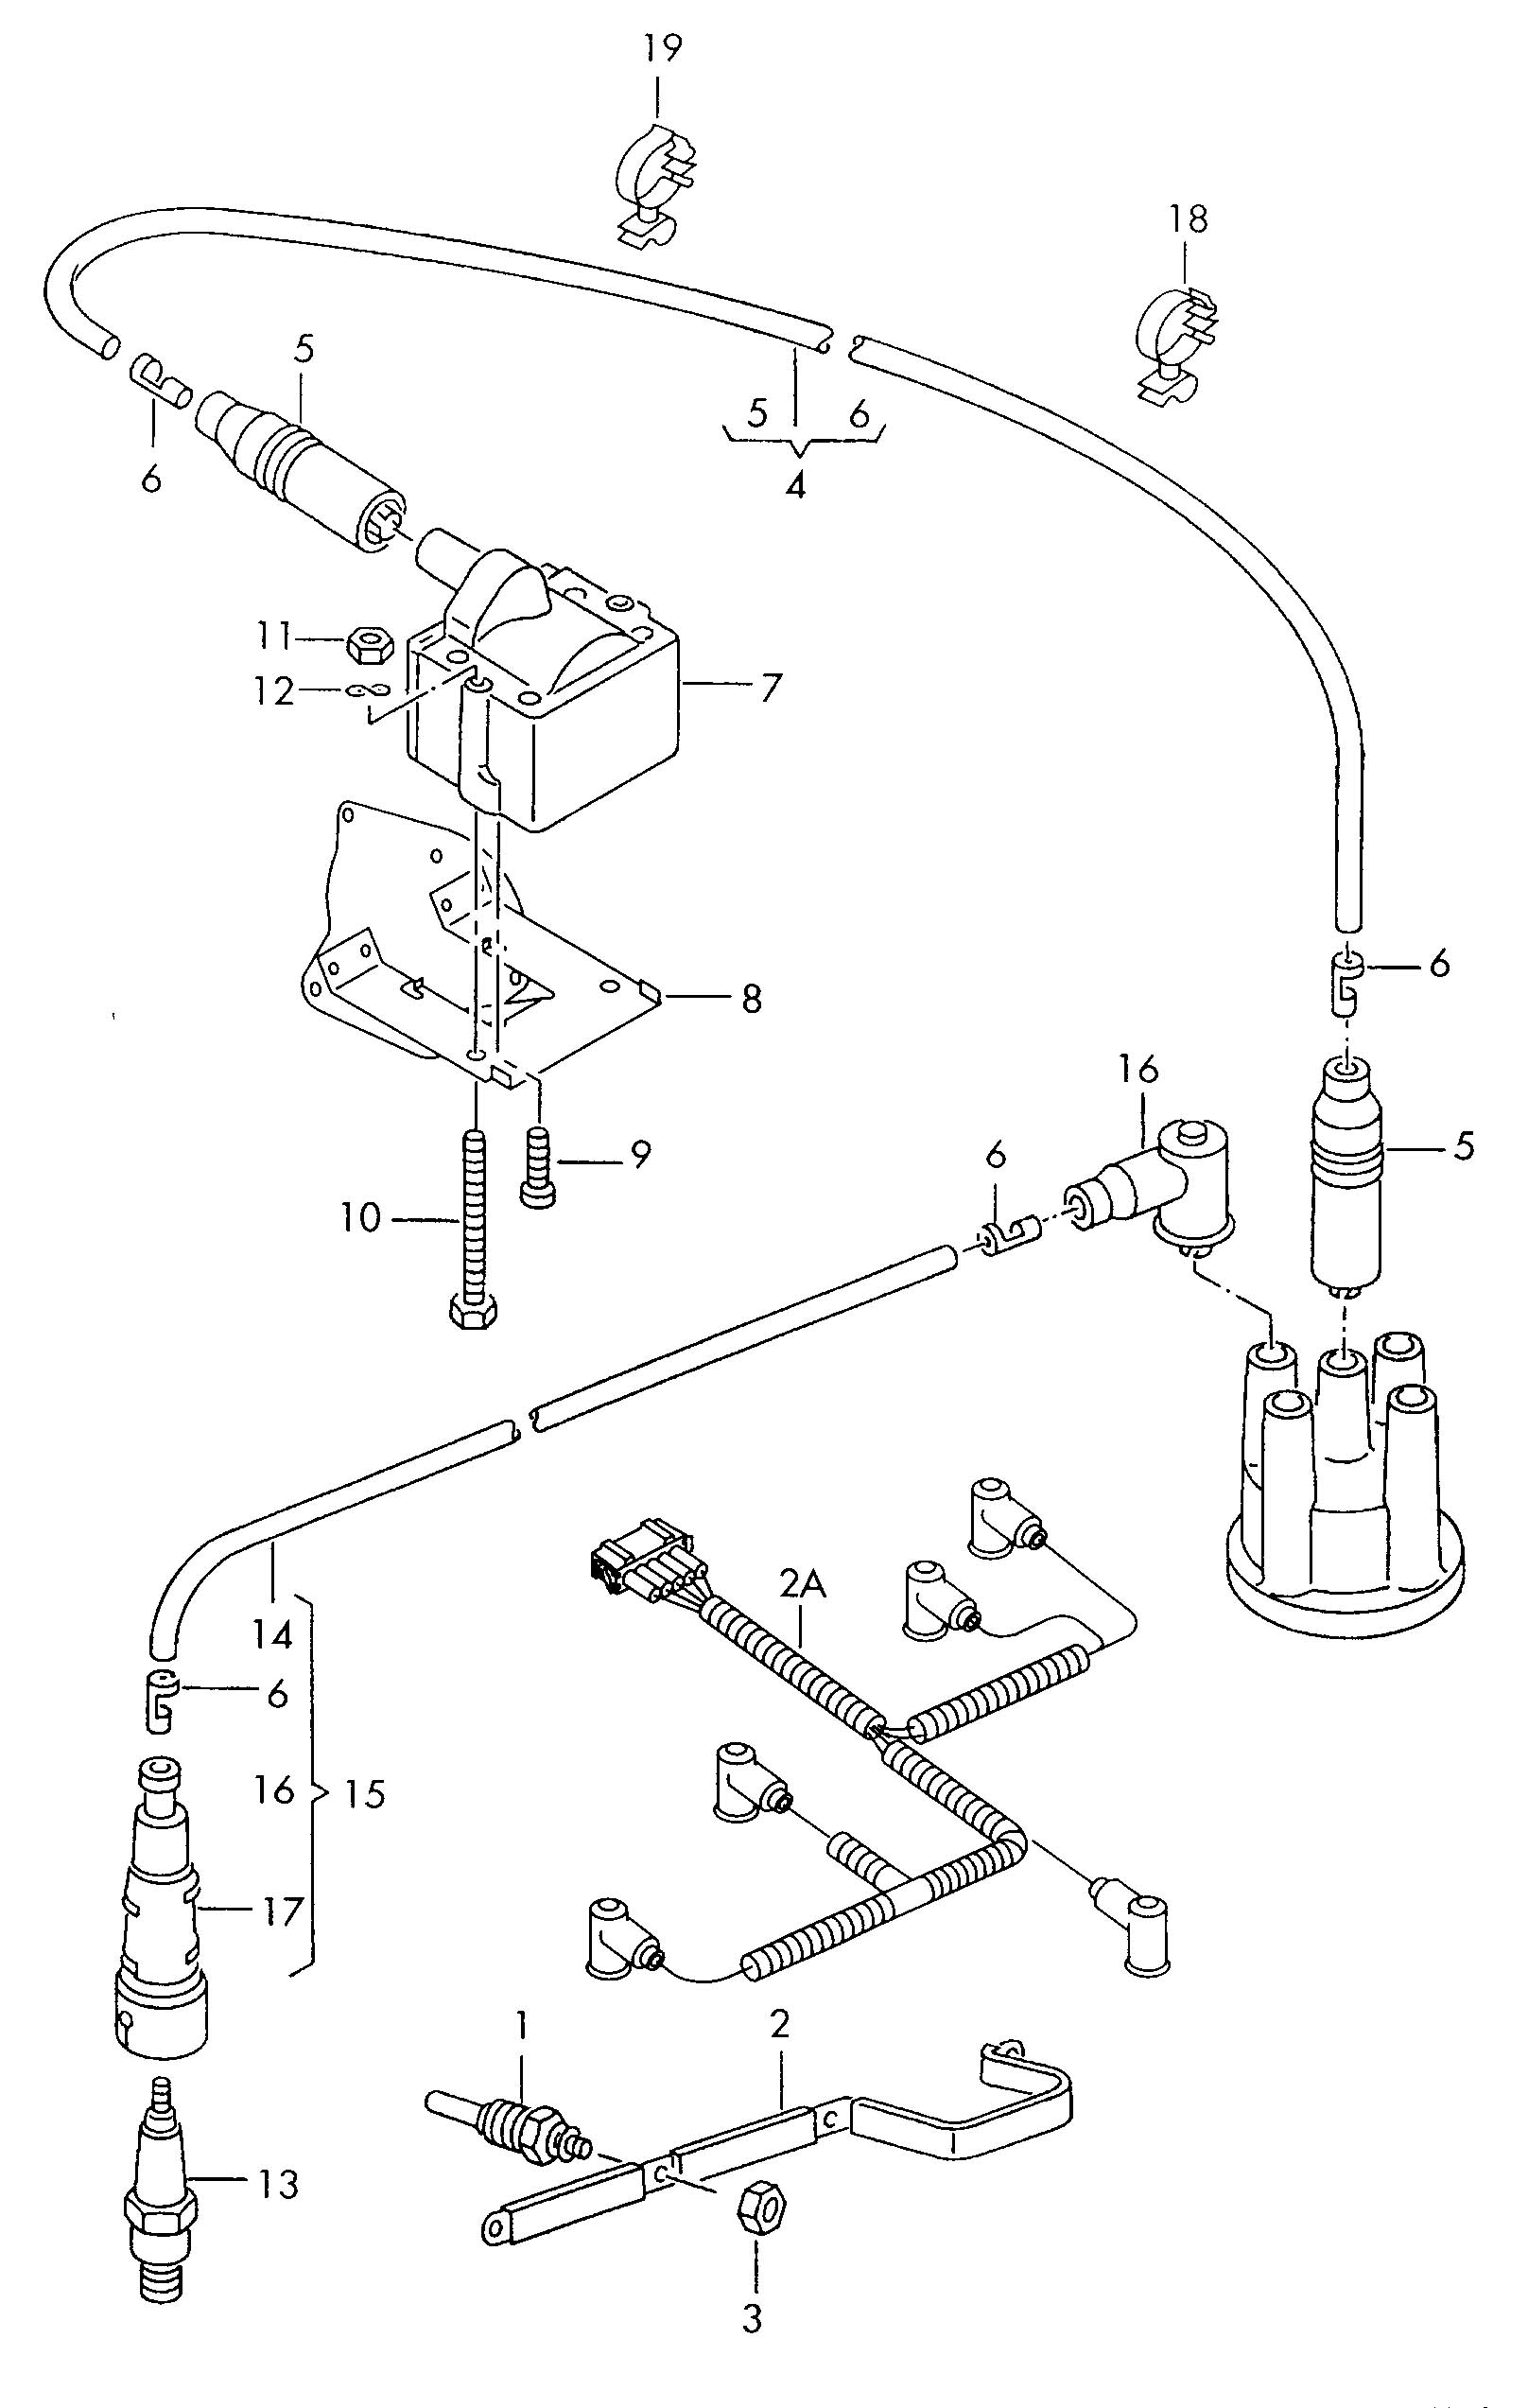 tekonsha brake controller wiring diagram for chevy